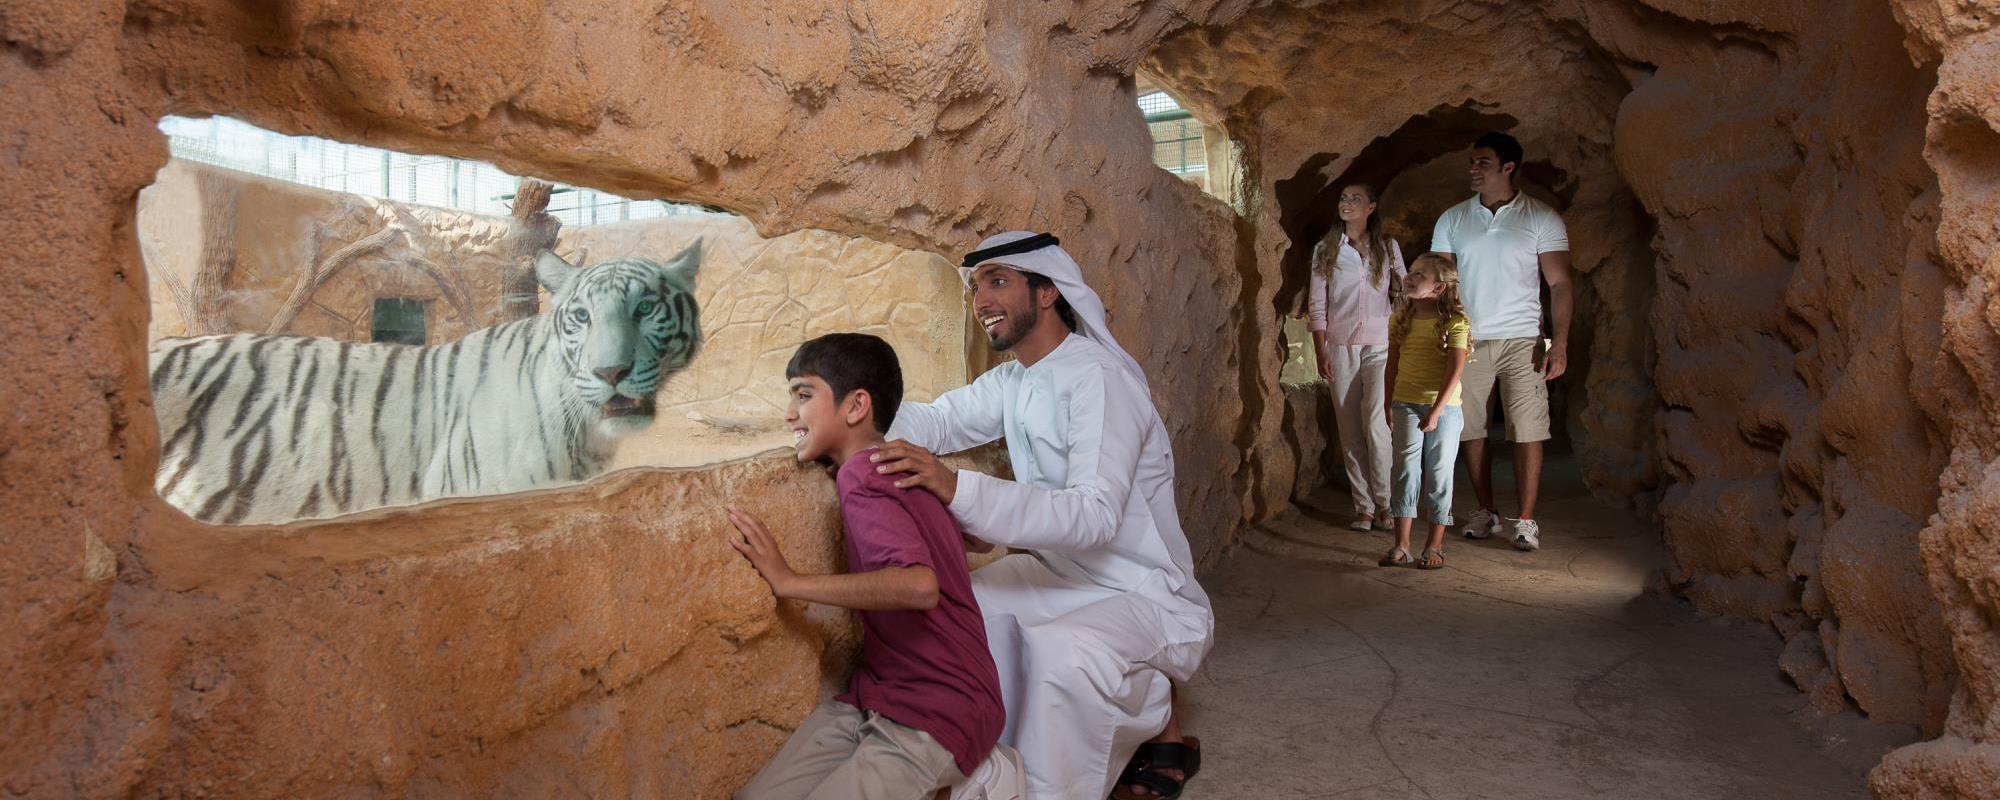 Emirates Park Zoo In Abu Dhabi Visitabudhabi Ae